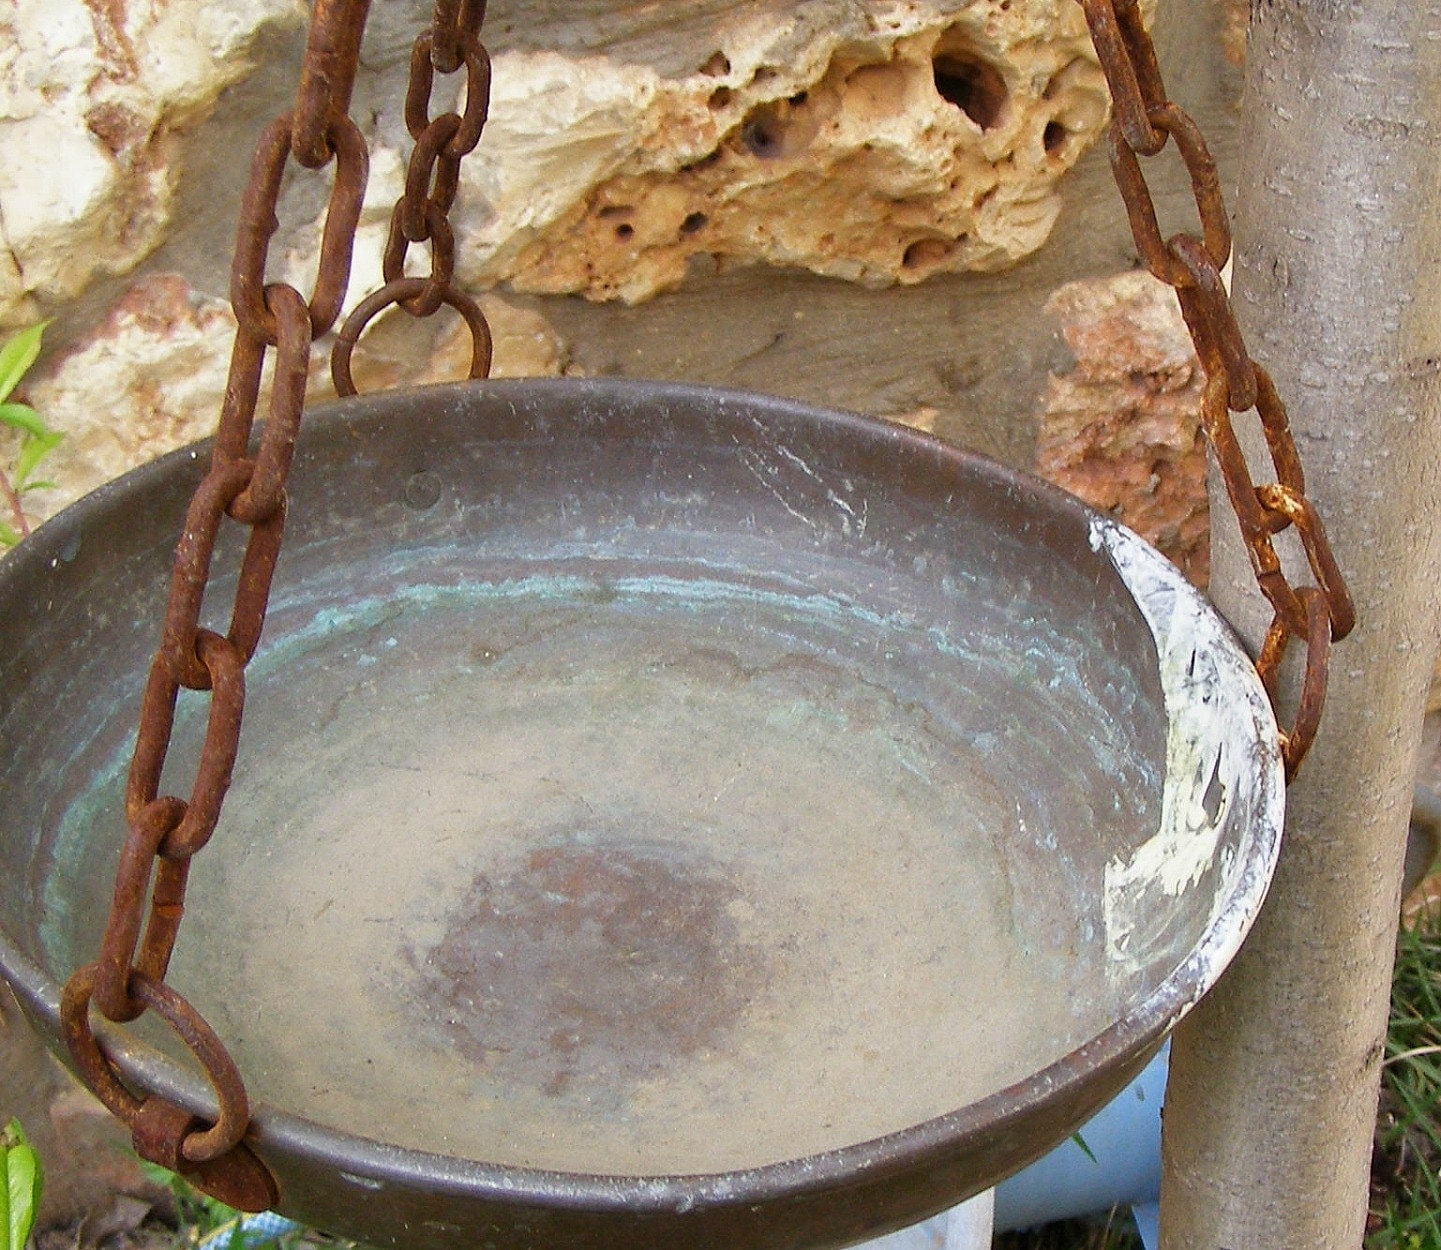 Vintage Rustic Planter Copper Hanging Bowl Metal By Meshumash